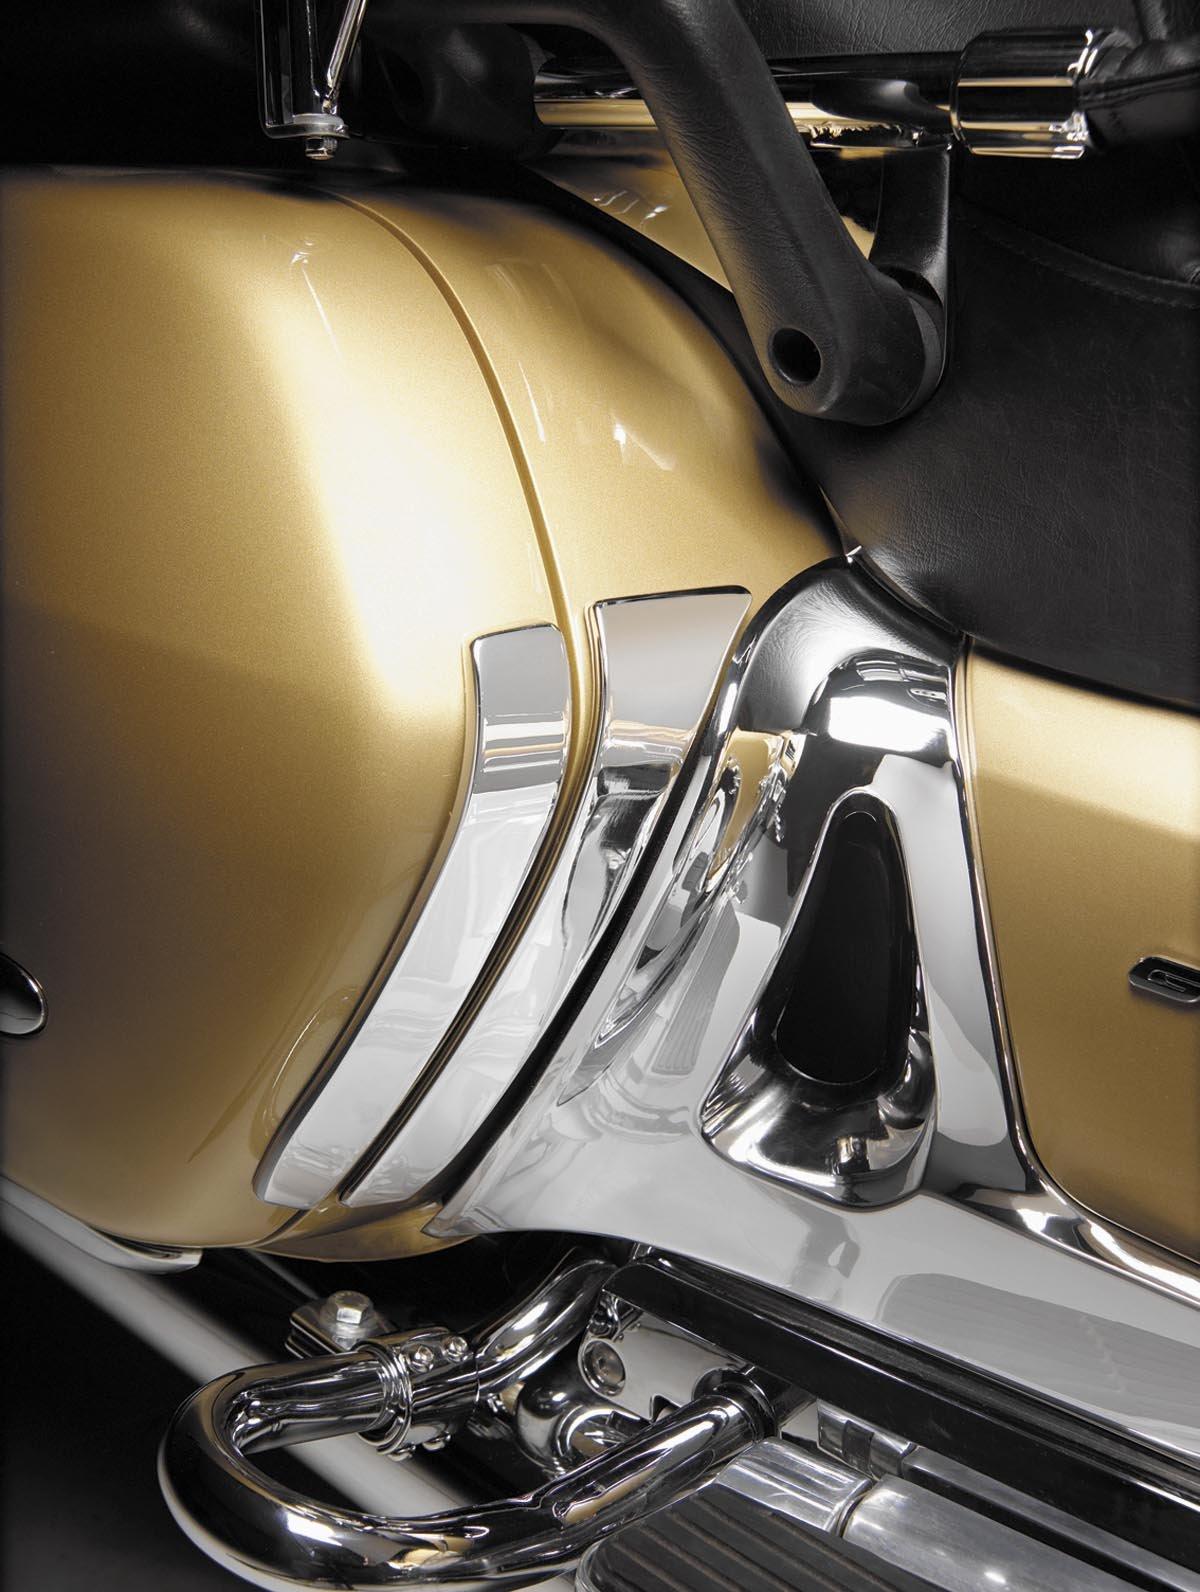 Show Chrome Accessories 52-761 Chrome Saddlebag Scuff Plate